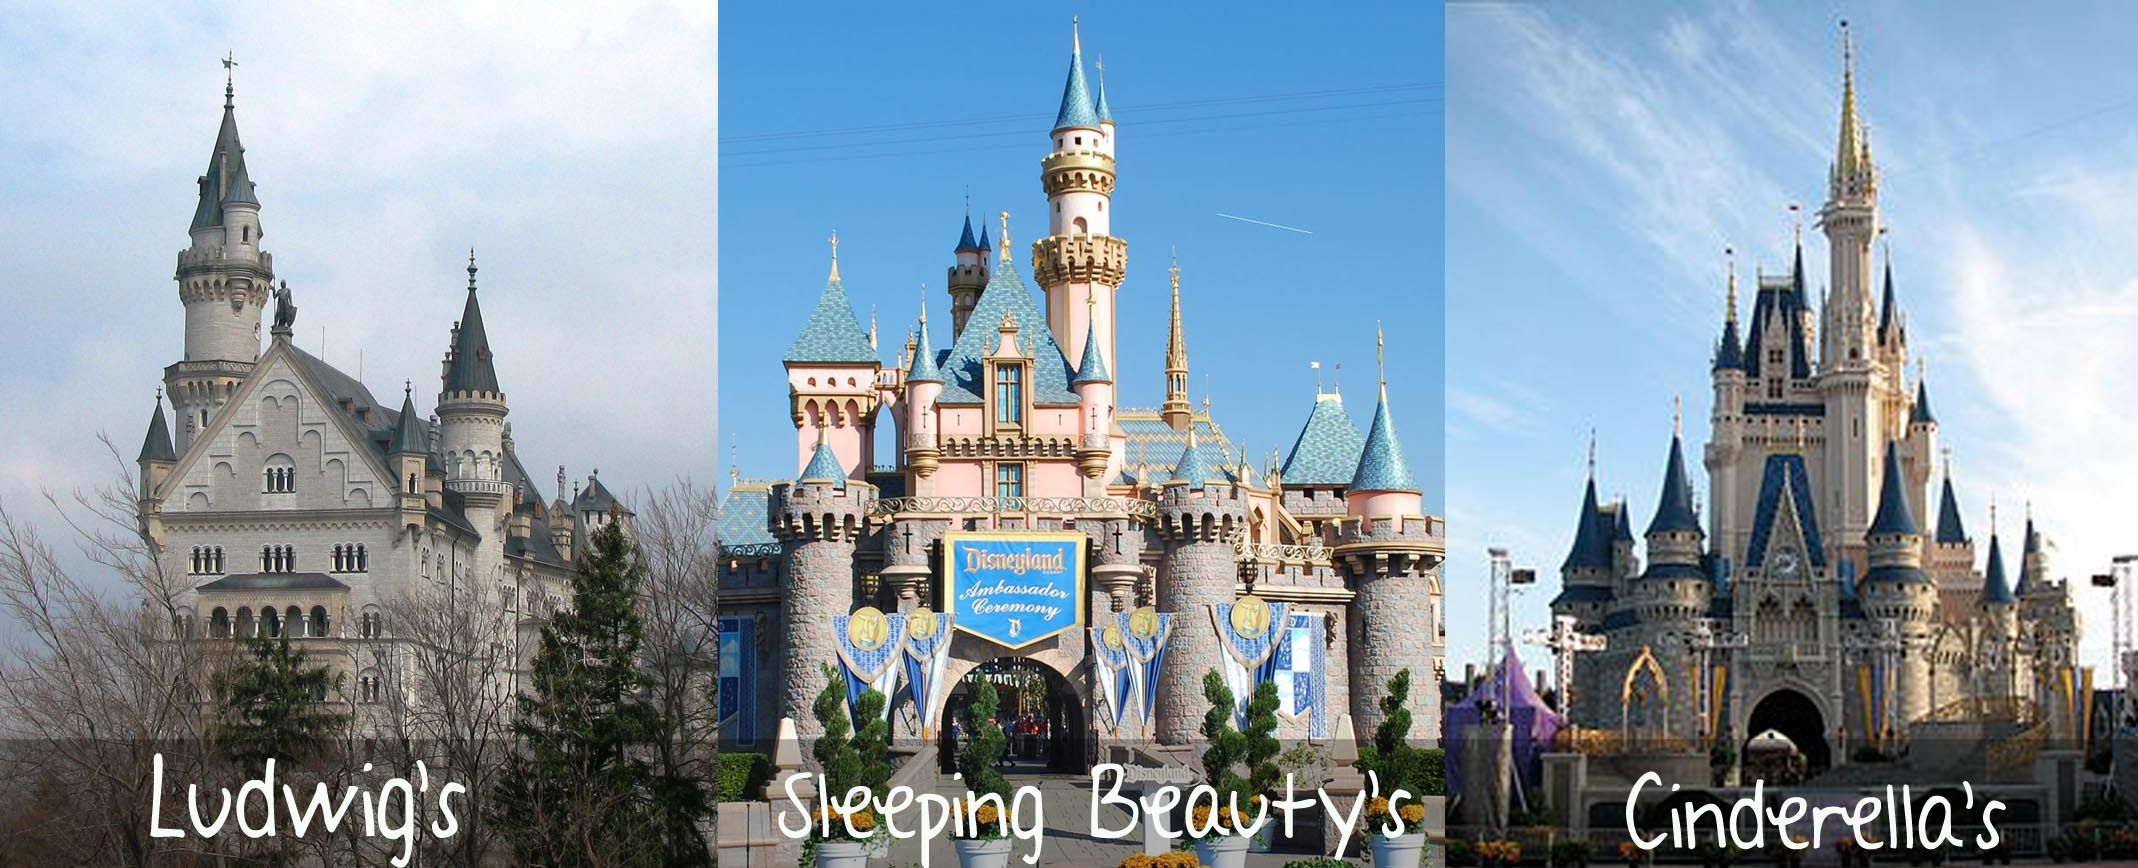 The Truth Behind That One Castle On Pinterest Castle Disney Castle Enchanted Castle